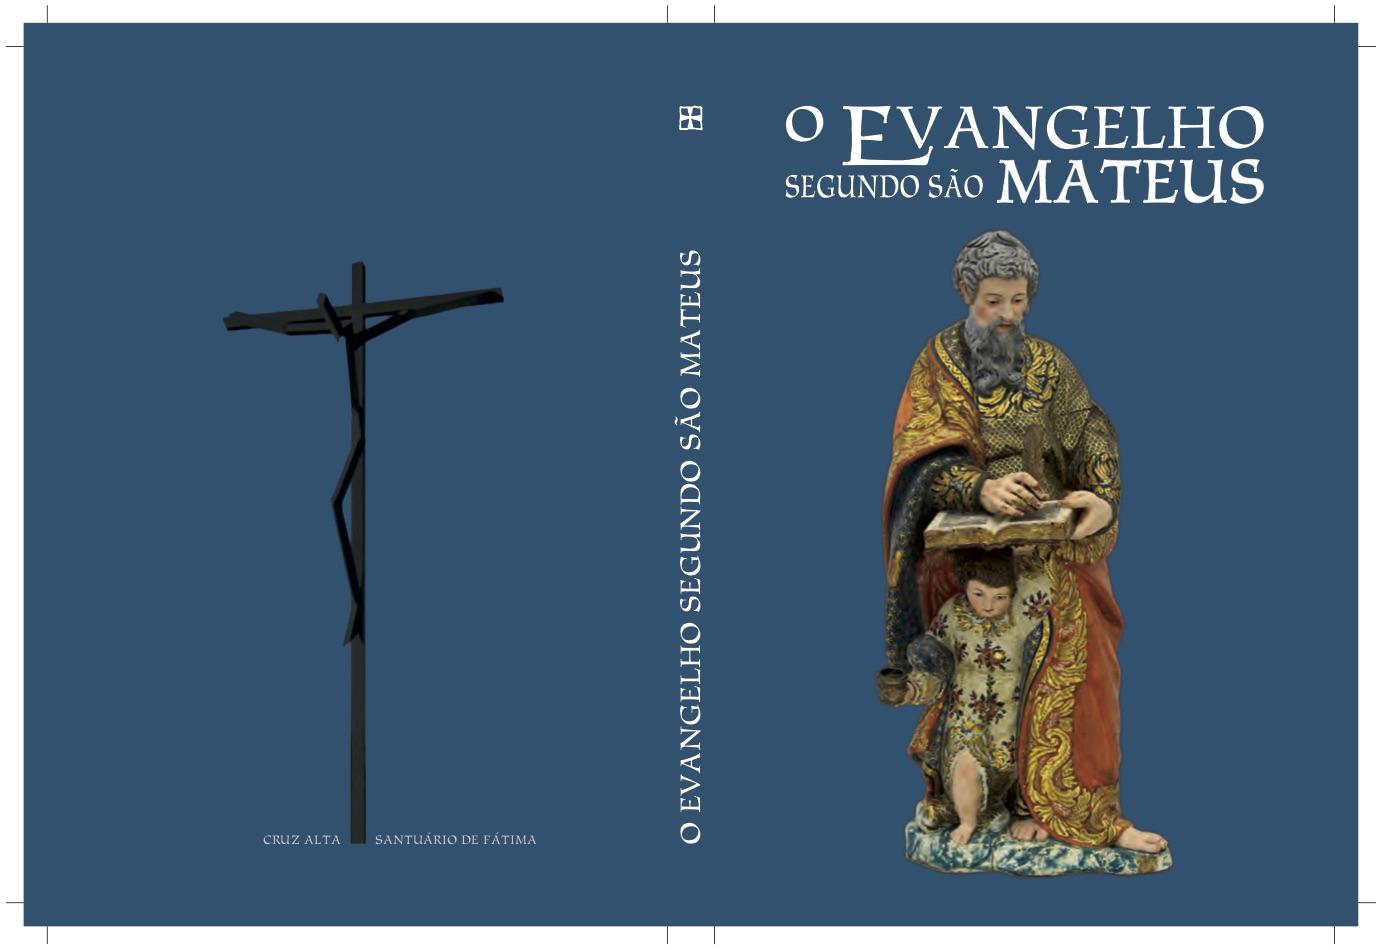 Capa Evangelho S. Mateus Jan2020.jpg